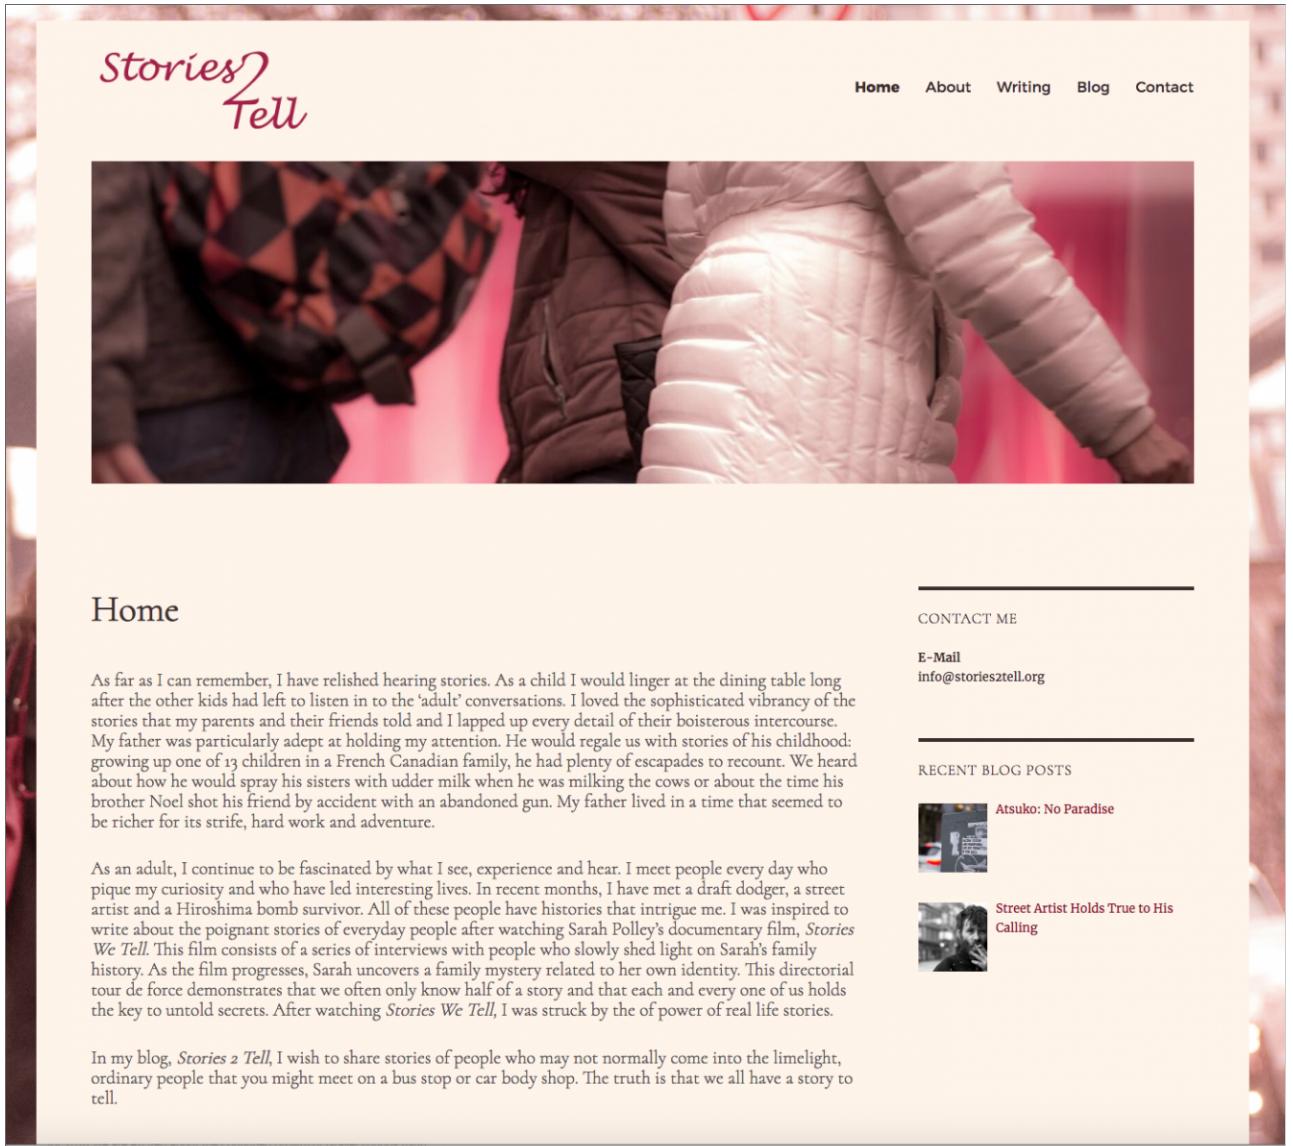 Stories2tellpage